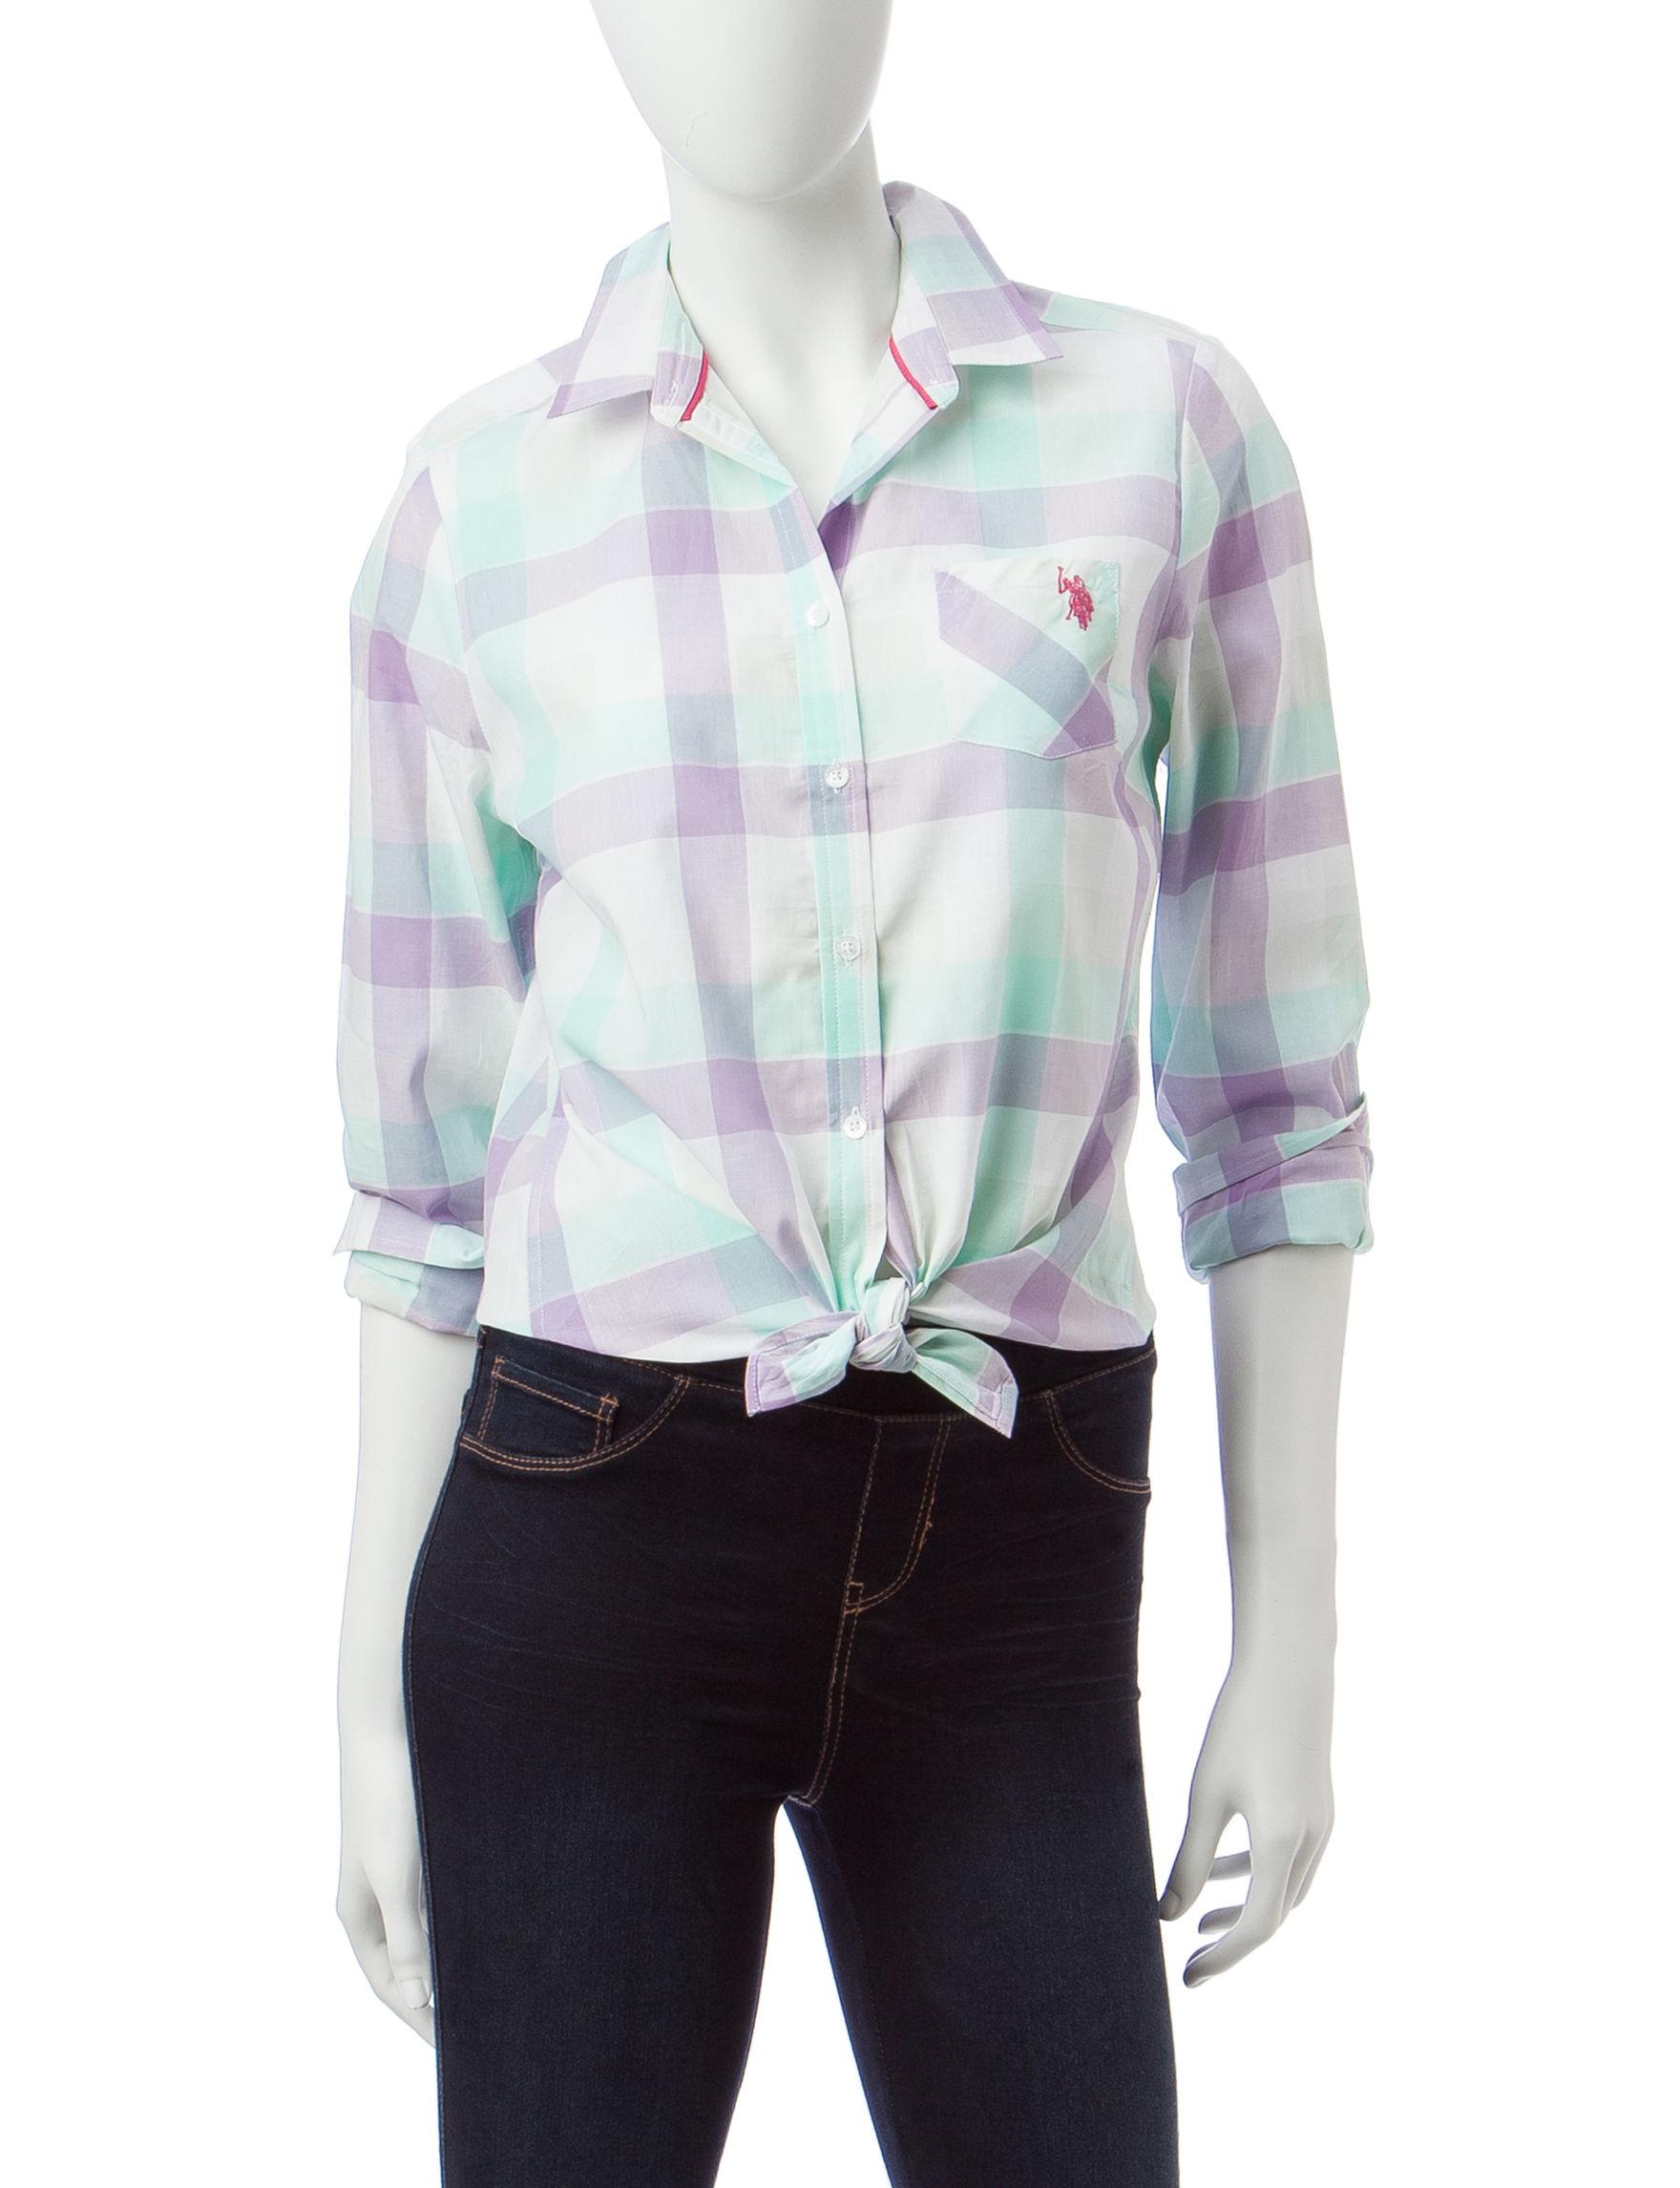 U.S. Polo Assn. Purple Shirts & Blouses